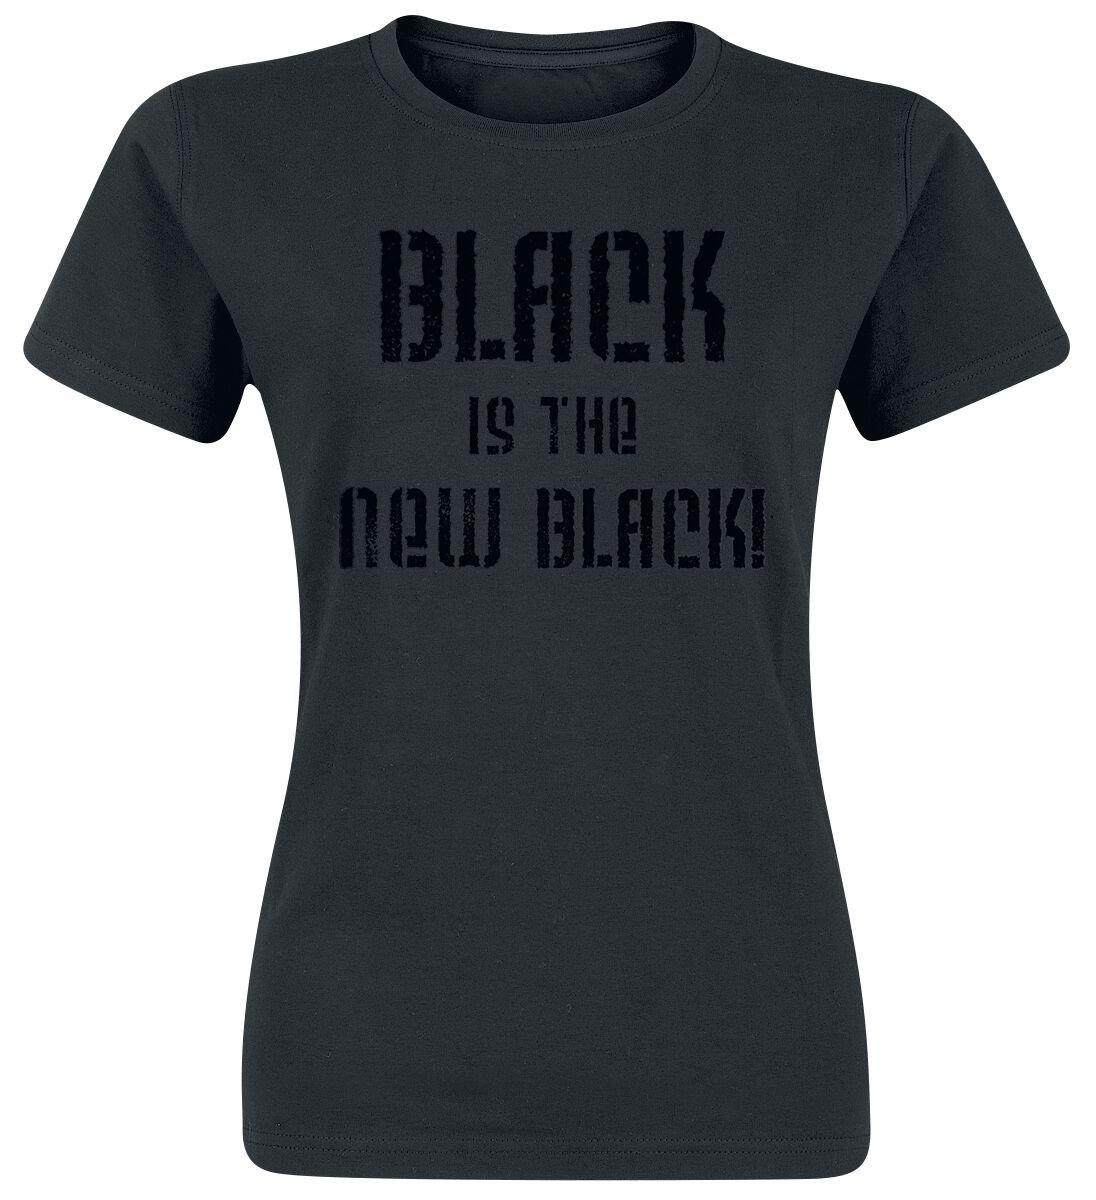 Fun Shirts - Koszulki - Koszulka damska Black Is The New Black! Koszulka damska czarny - 349801